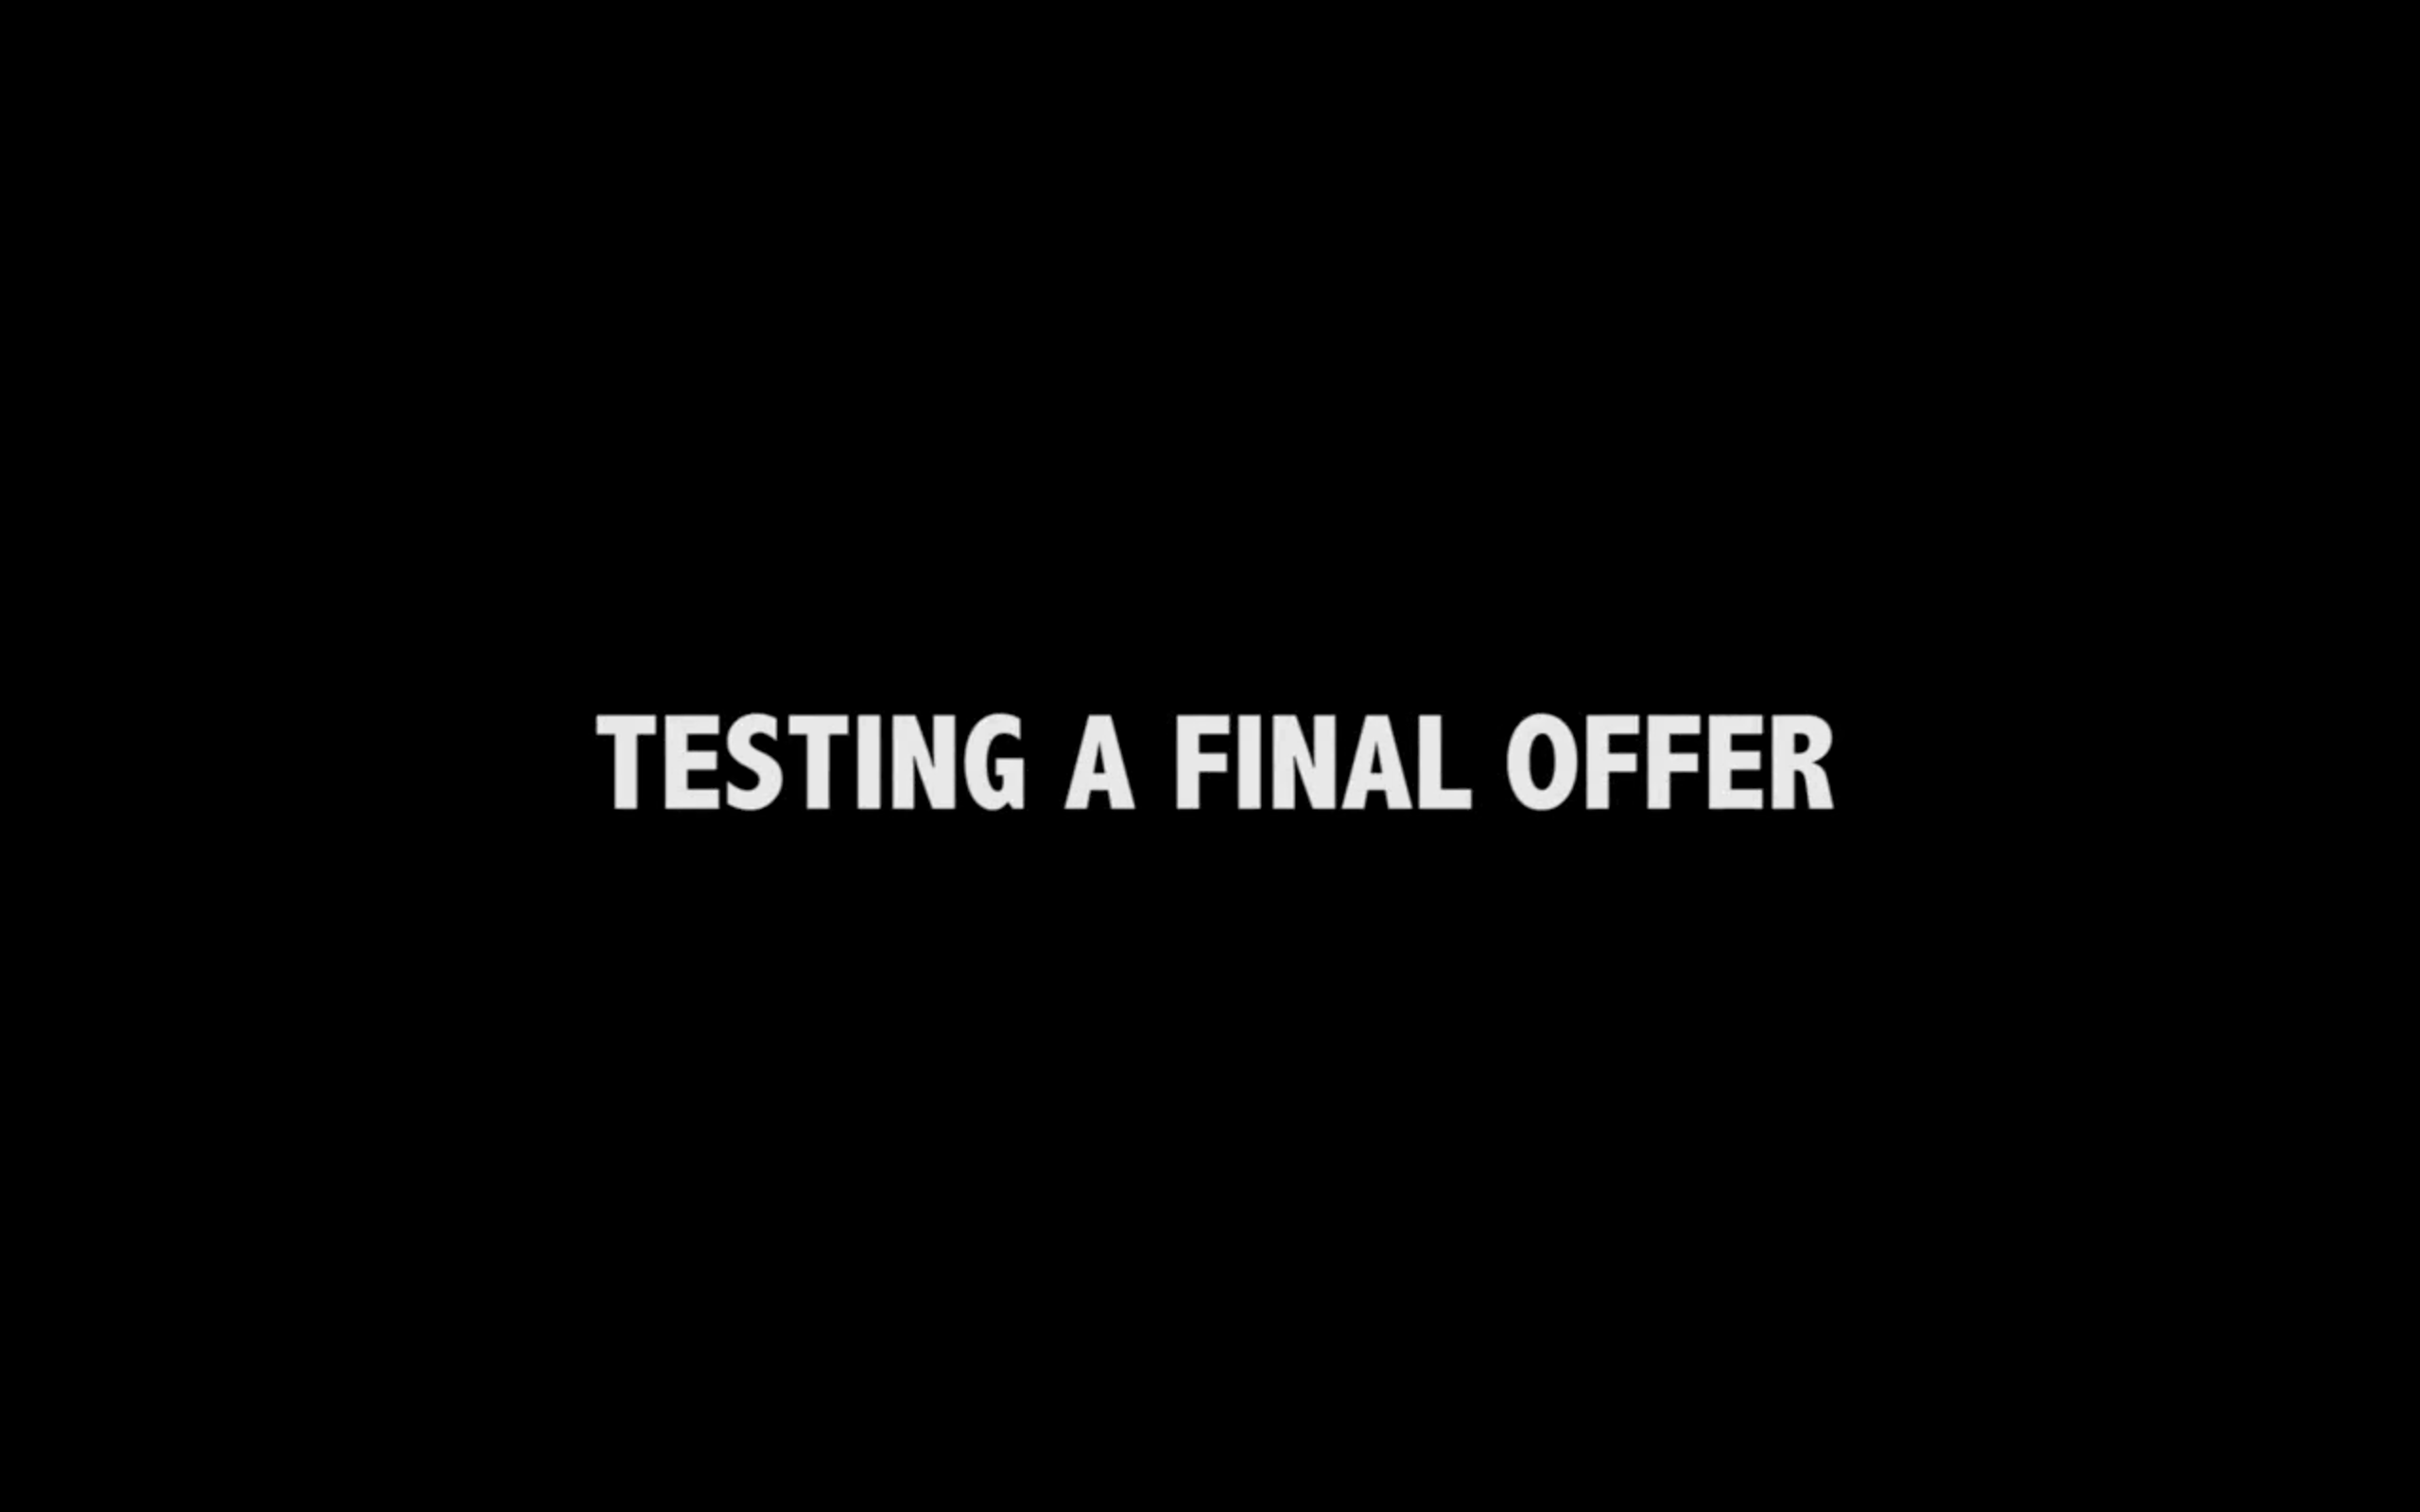 Testing A Final Offer